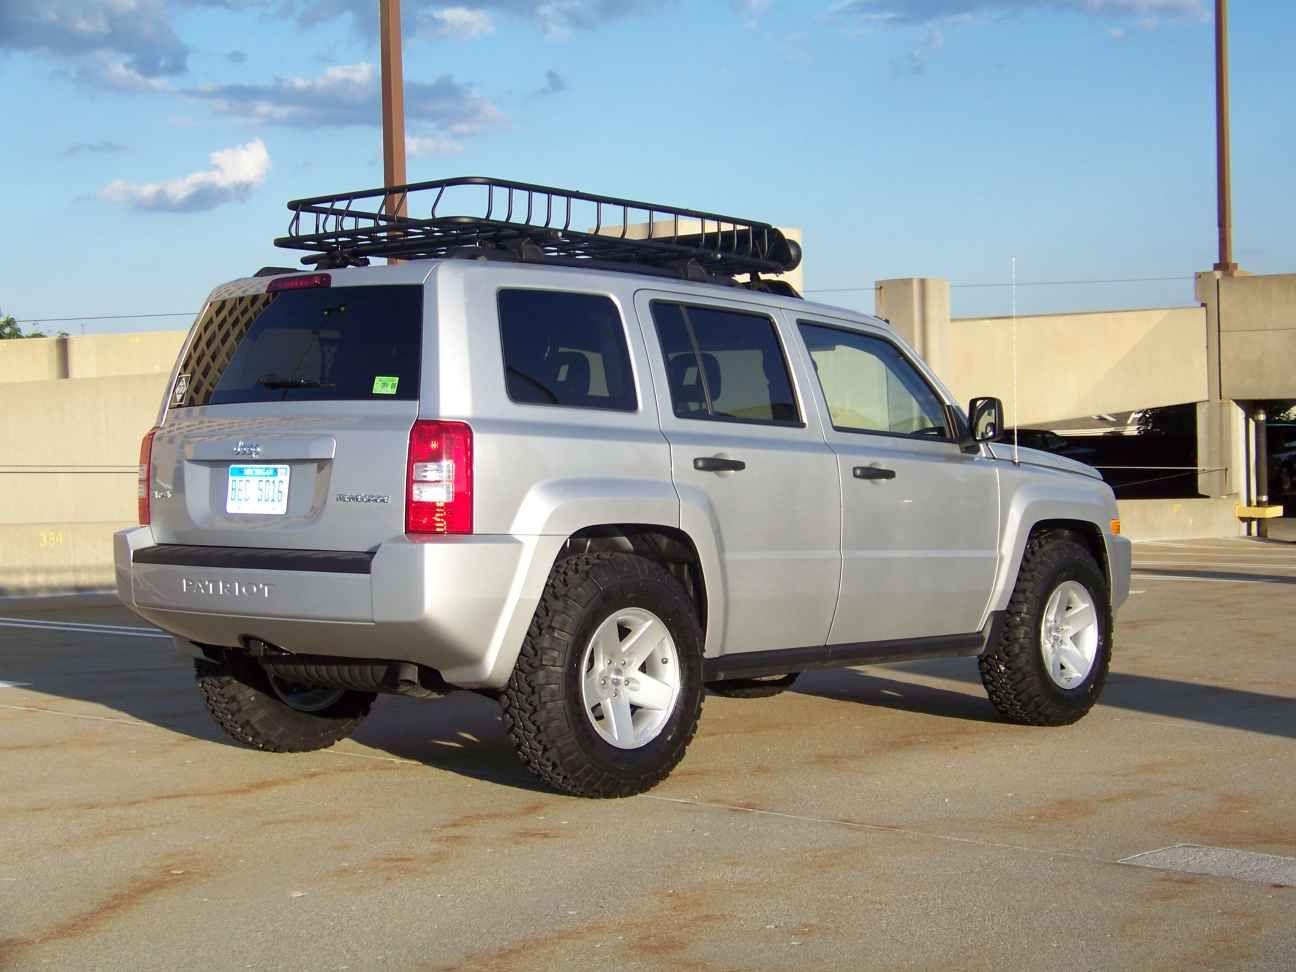 245 65 16 gdyr 1296 x 972 92 lifted jeep. Black Bedroom Furniture Sets. Home Design Ideas